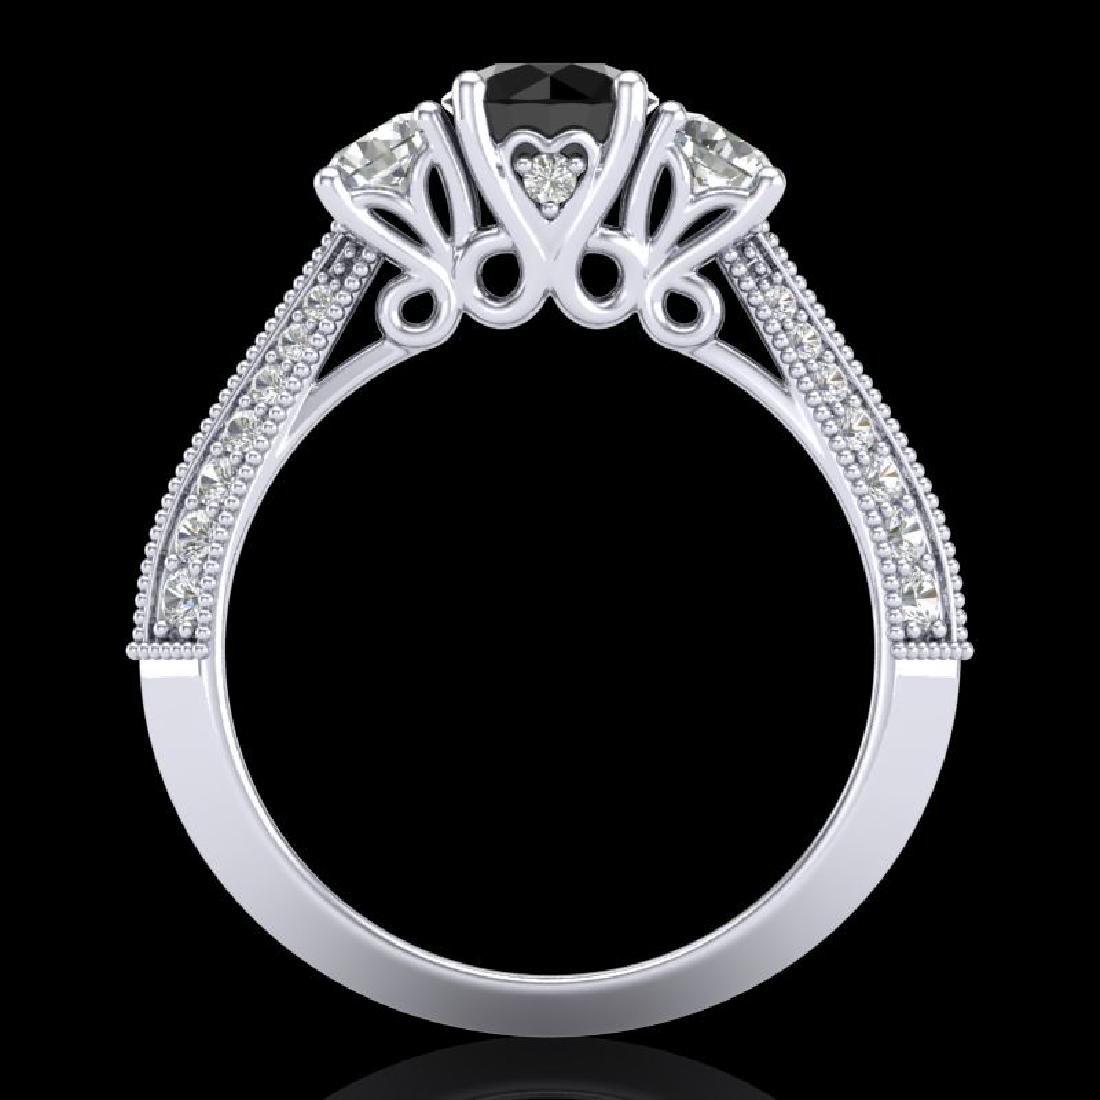 1.81 CTW Fancy Black Diamond Solitaire Art Deco 3 Stone - 3